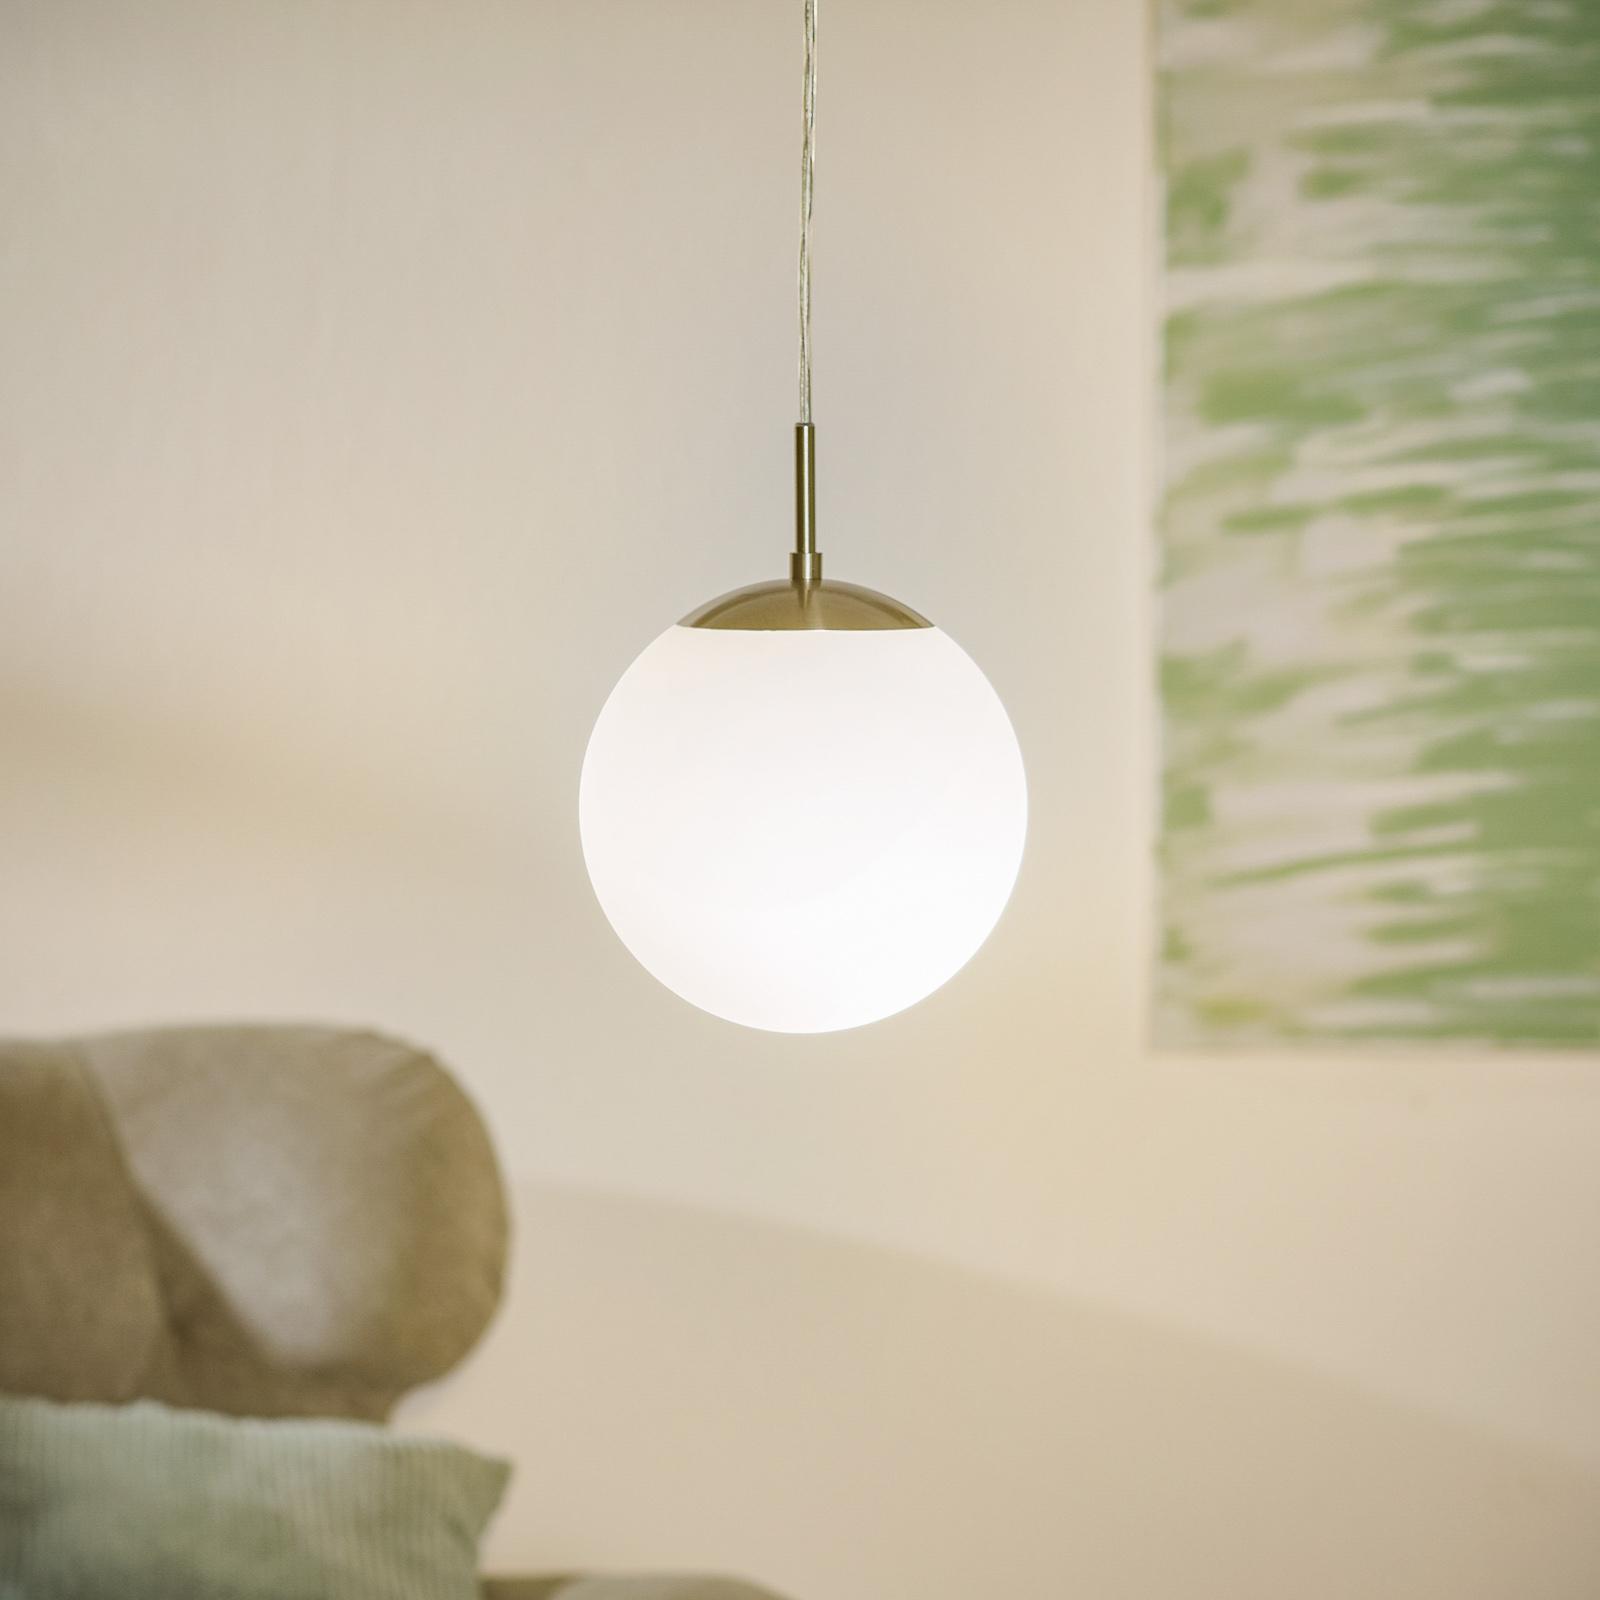 Elegante lampada a sospensione Rondo 20 cm